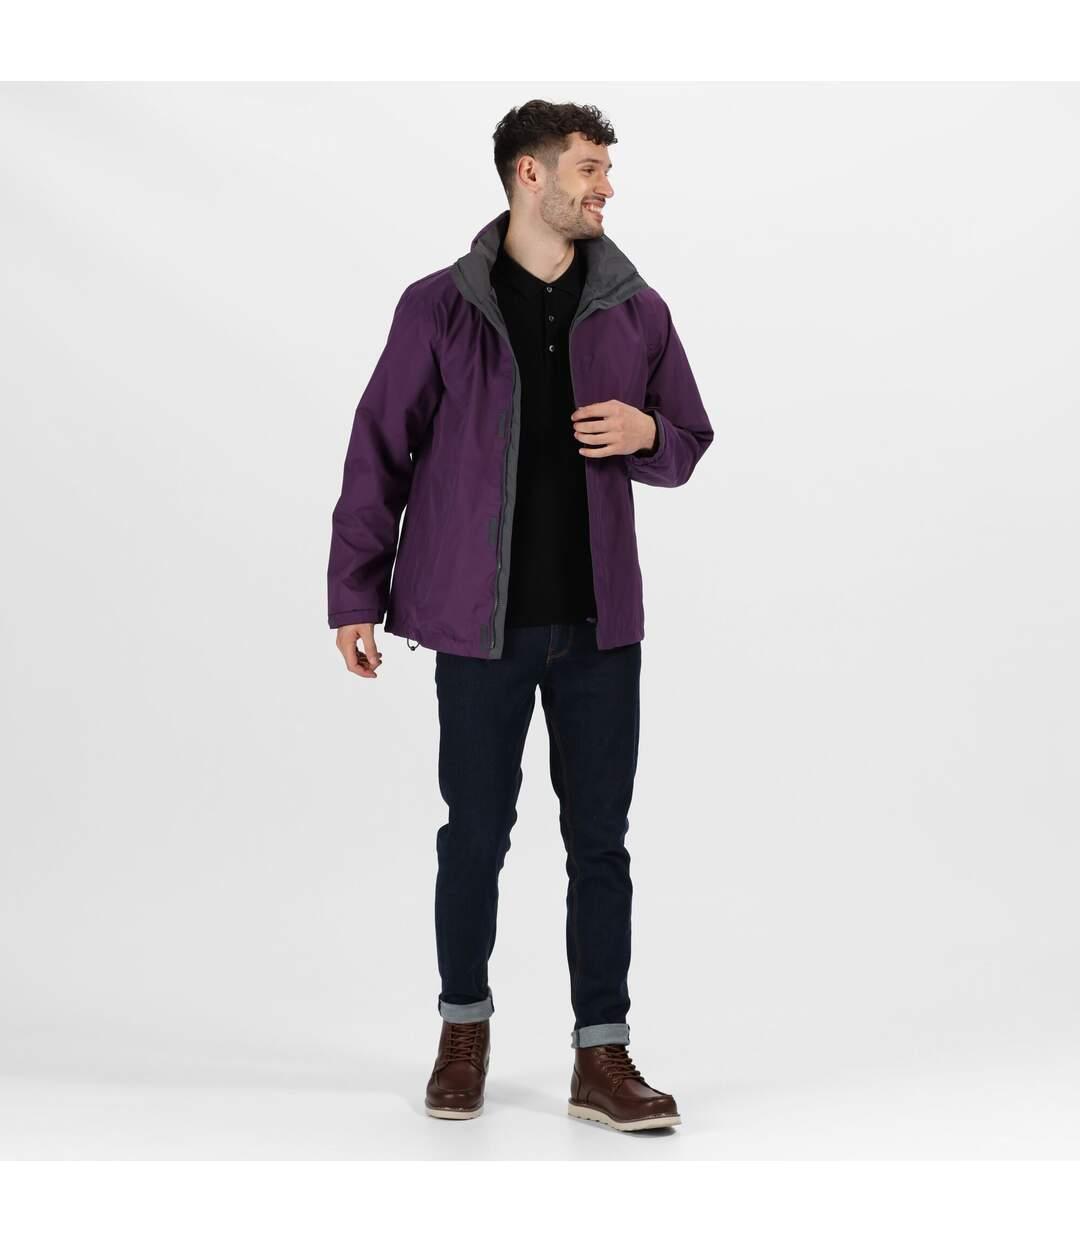 Regatta Mens Standout Ardmore Jacket (Waterproof & Windproof) (Majestic Purple/Seal Grey) - UTBC3041